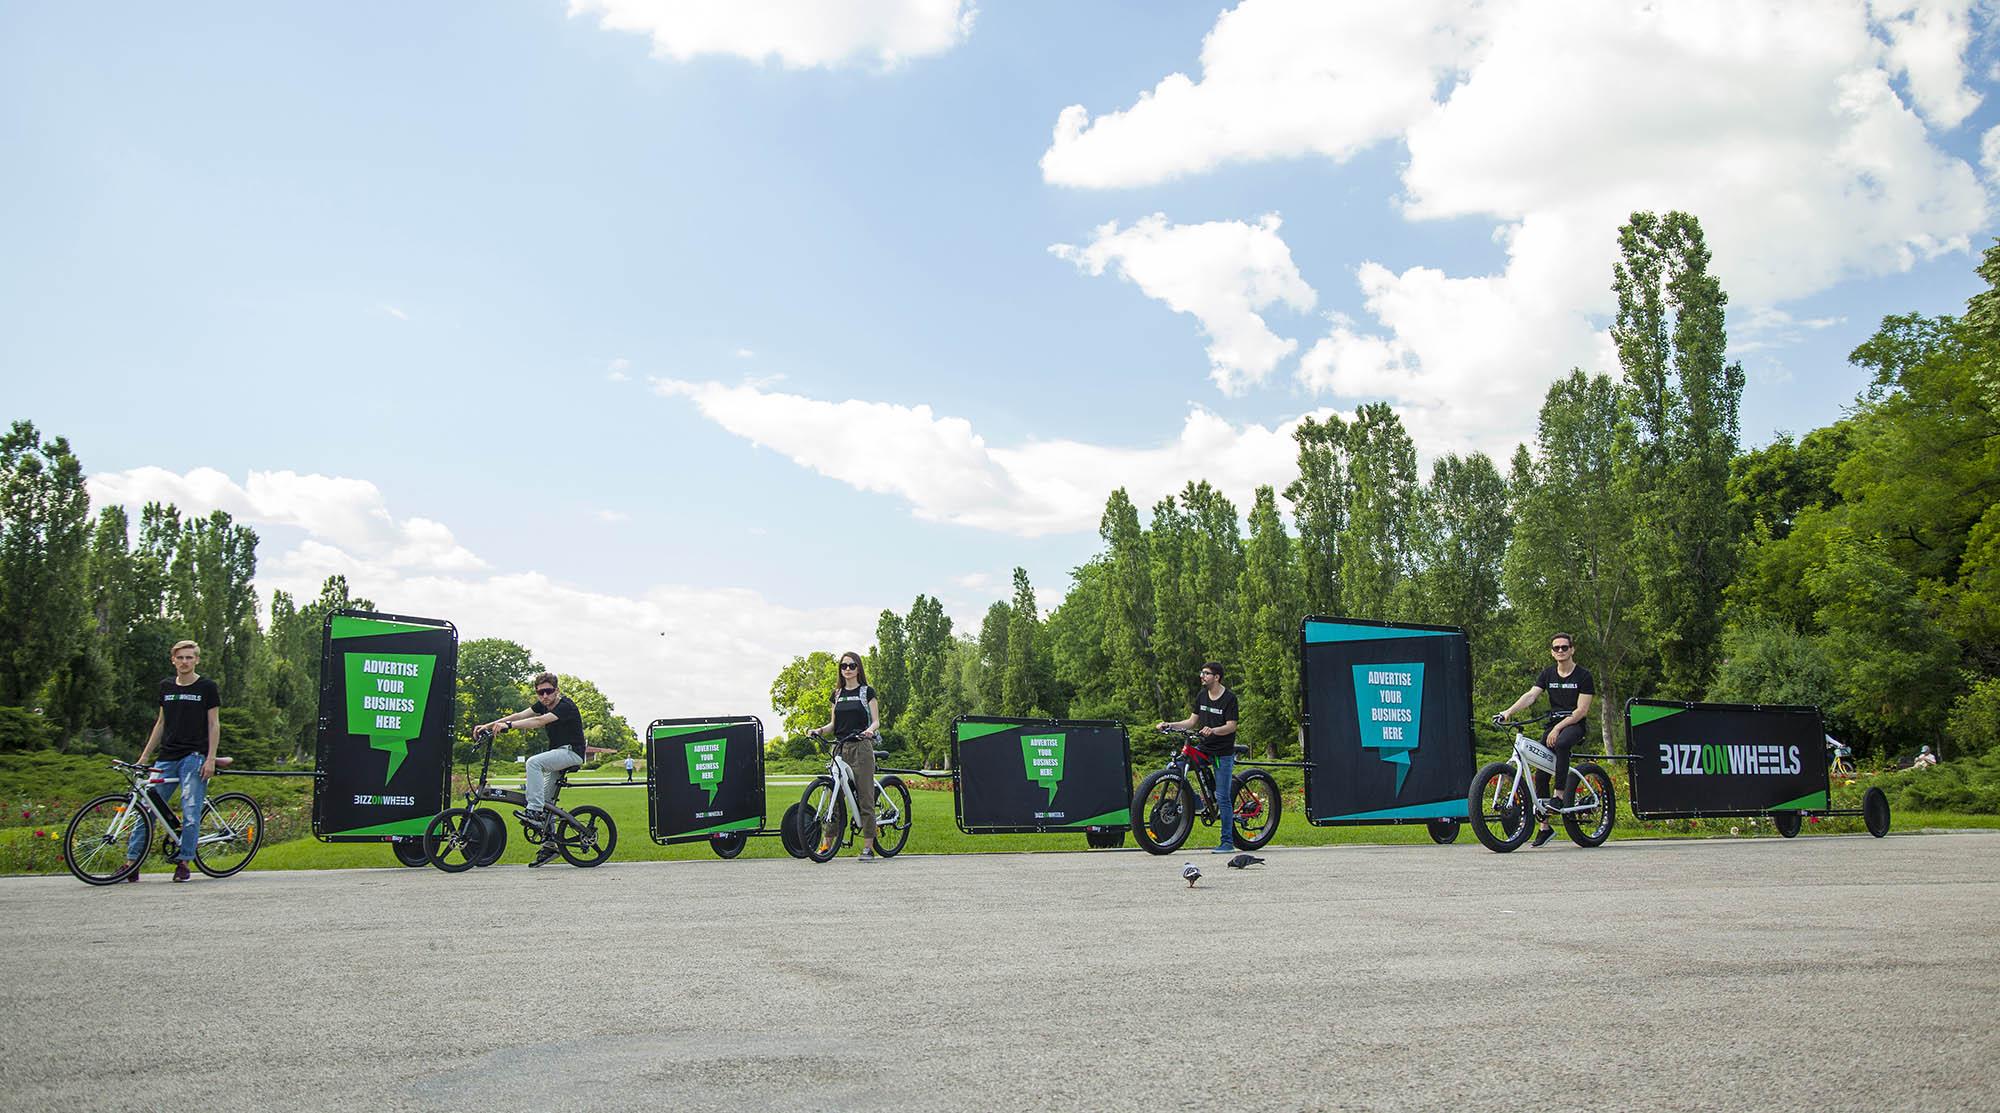 AdBicy advertising bike billboards in different sizes